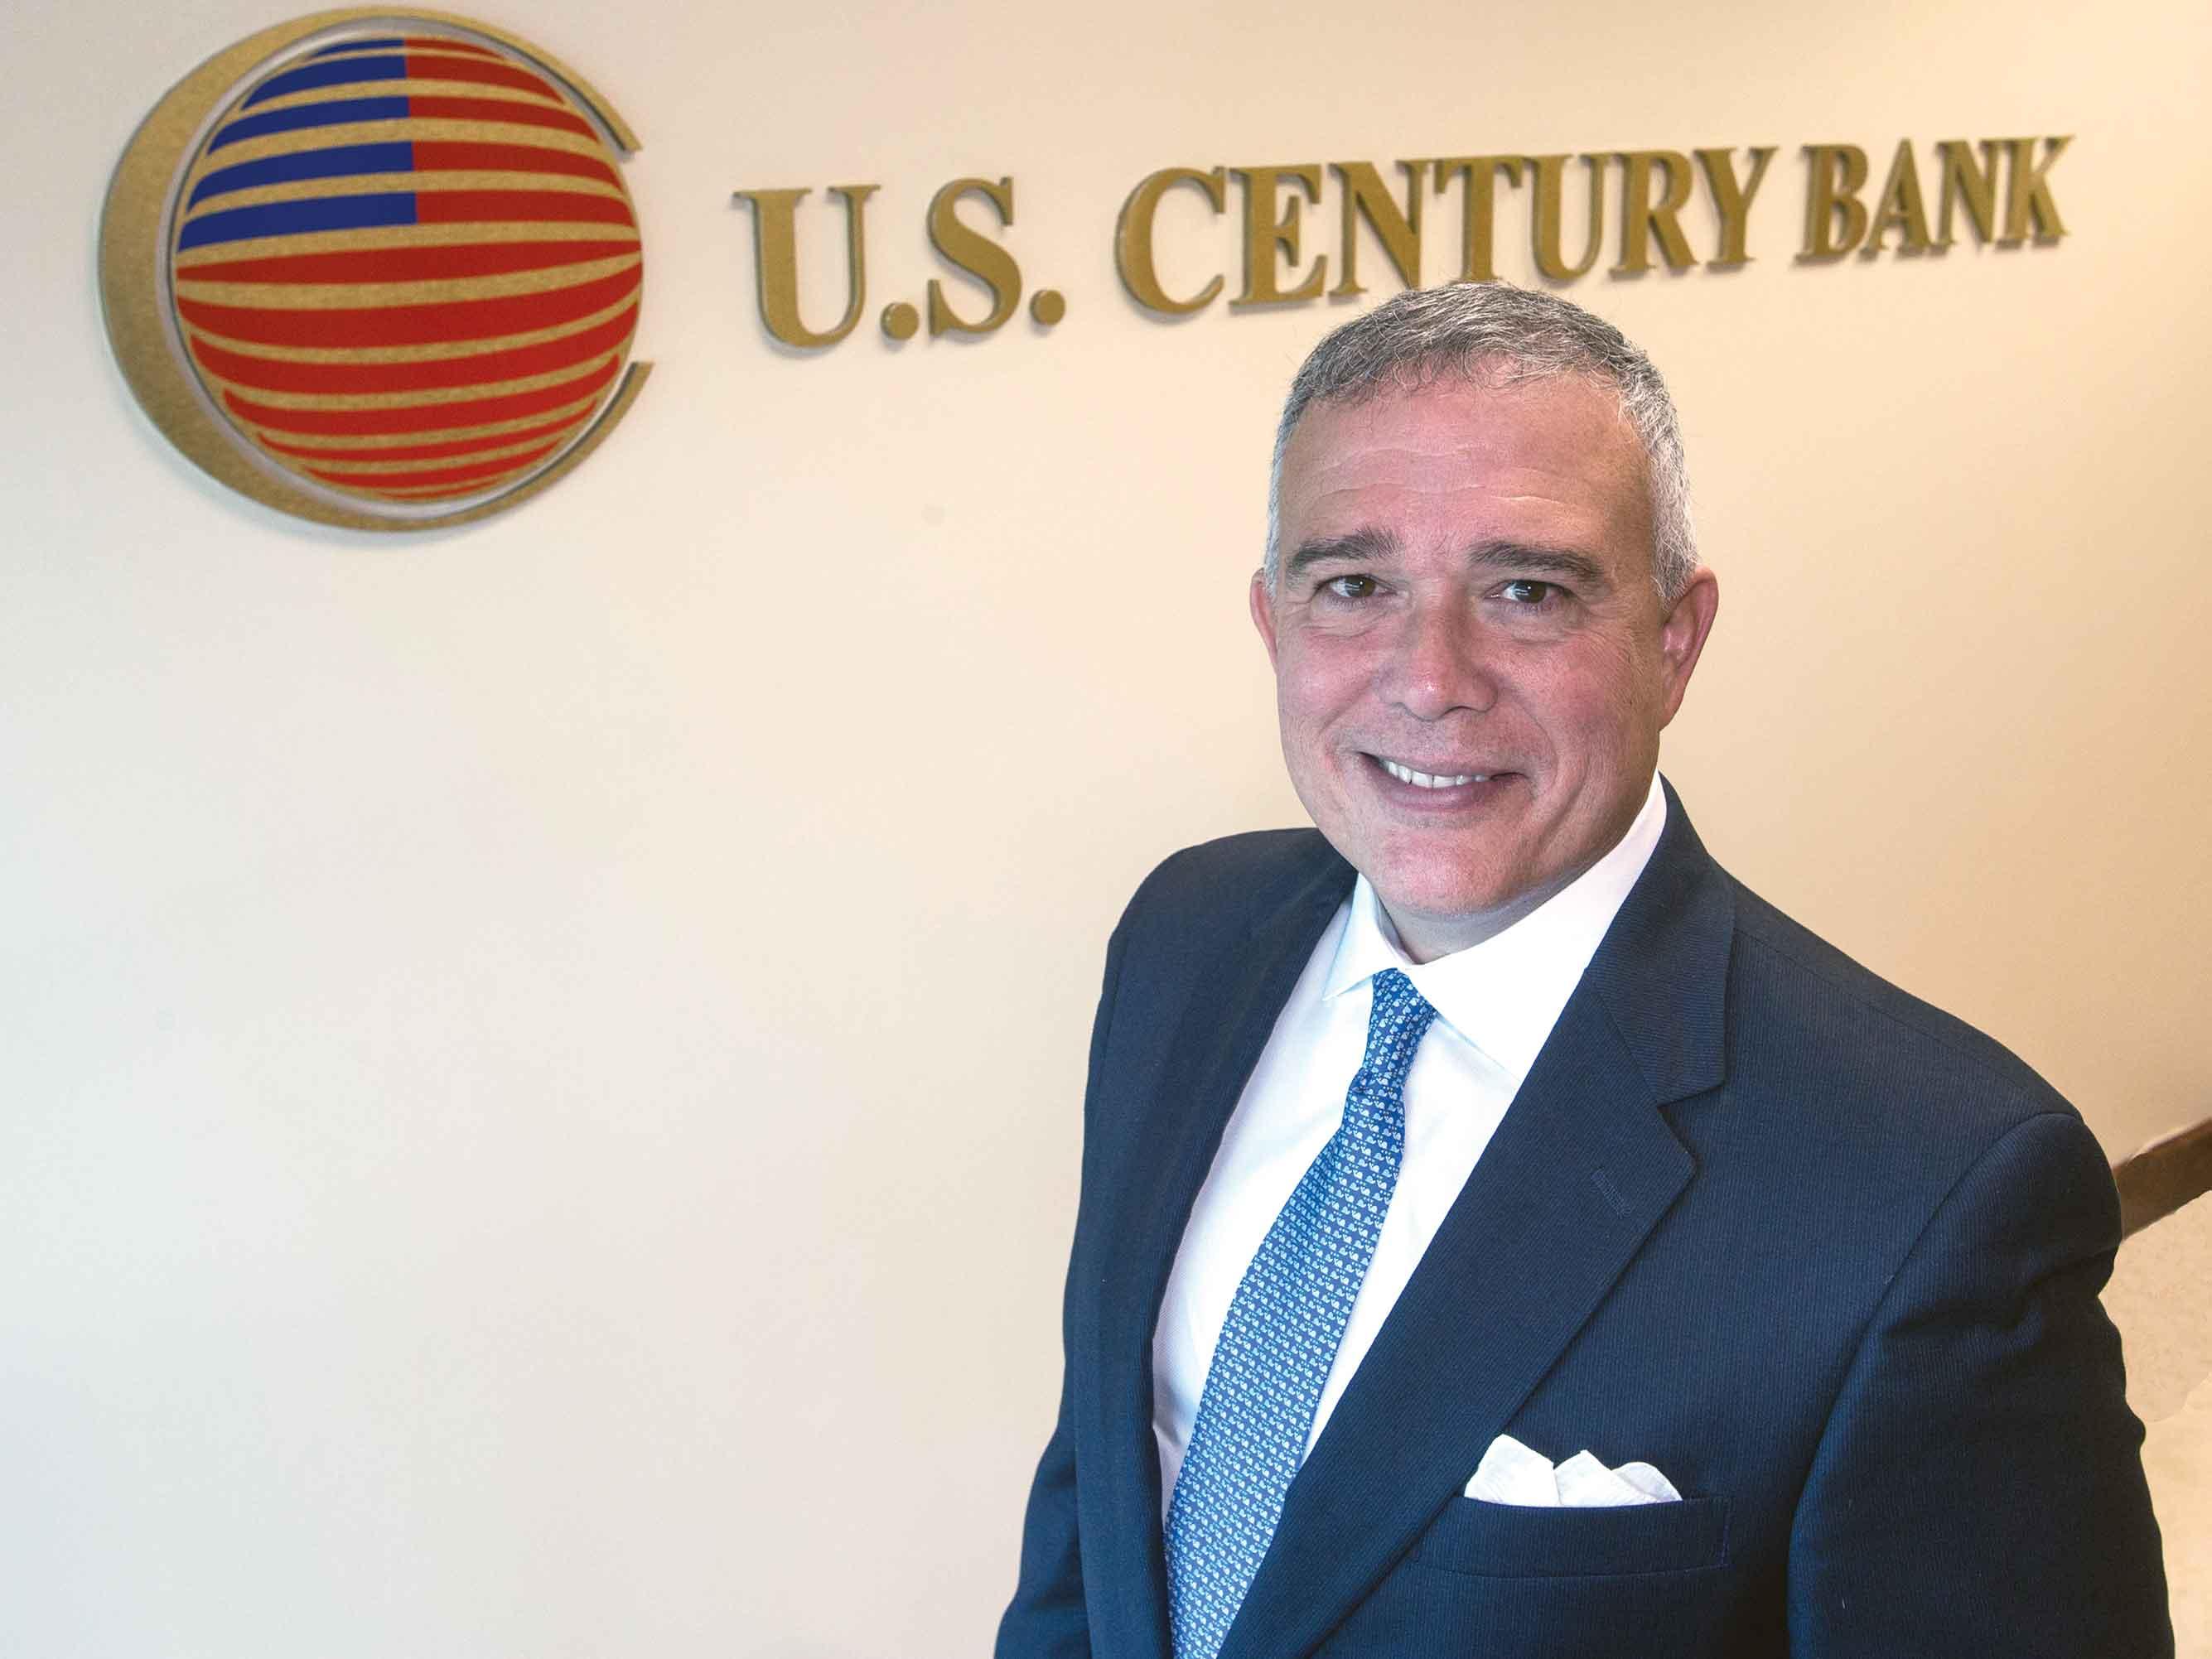 Luis de la Aguilera: President targets new markets for U.S. Century Bank